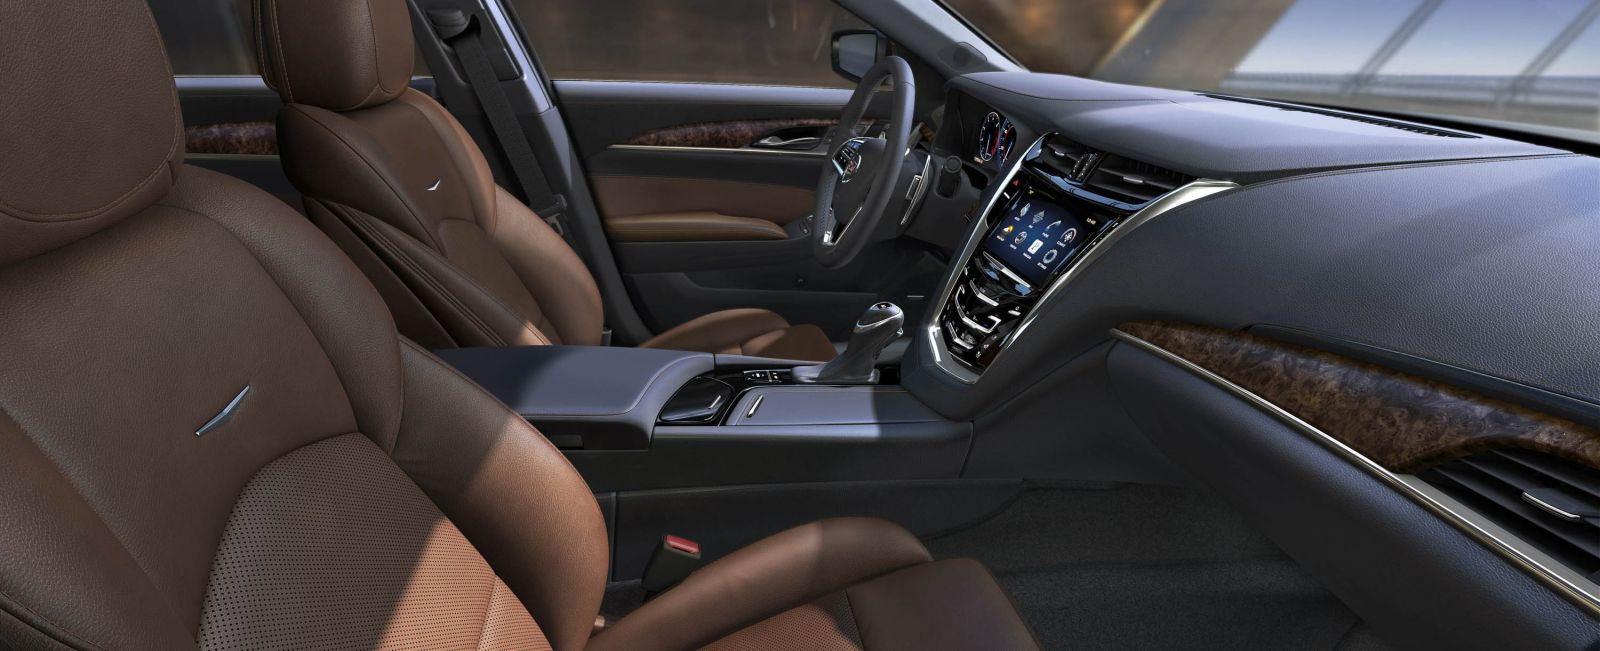 Le coupé Cadillac CTS